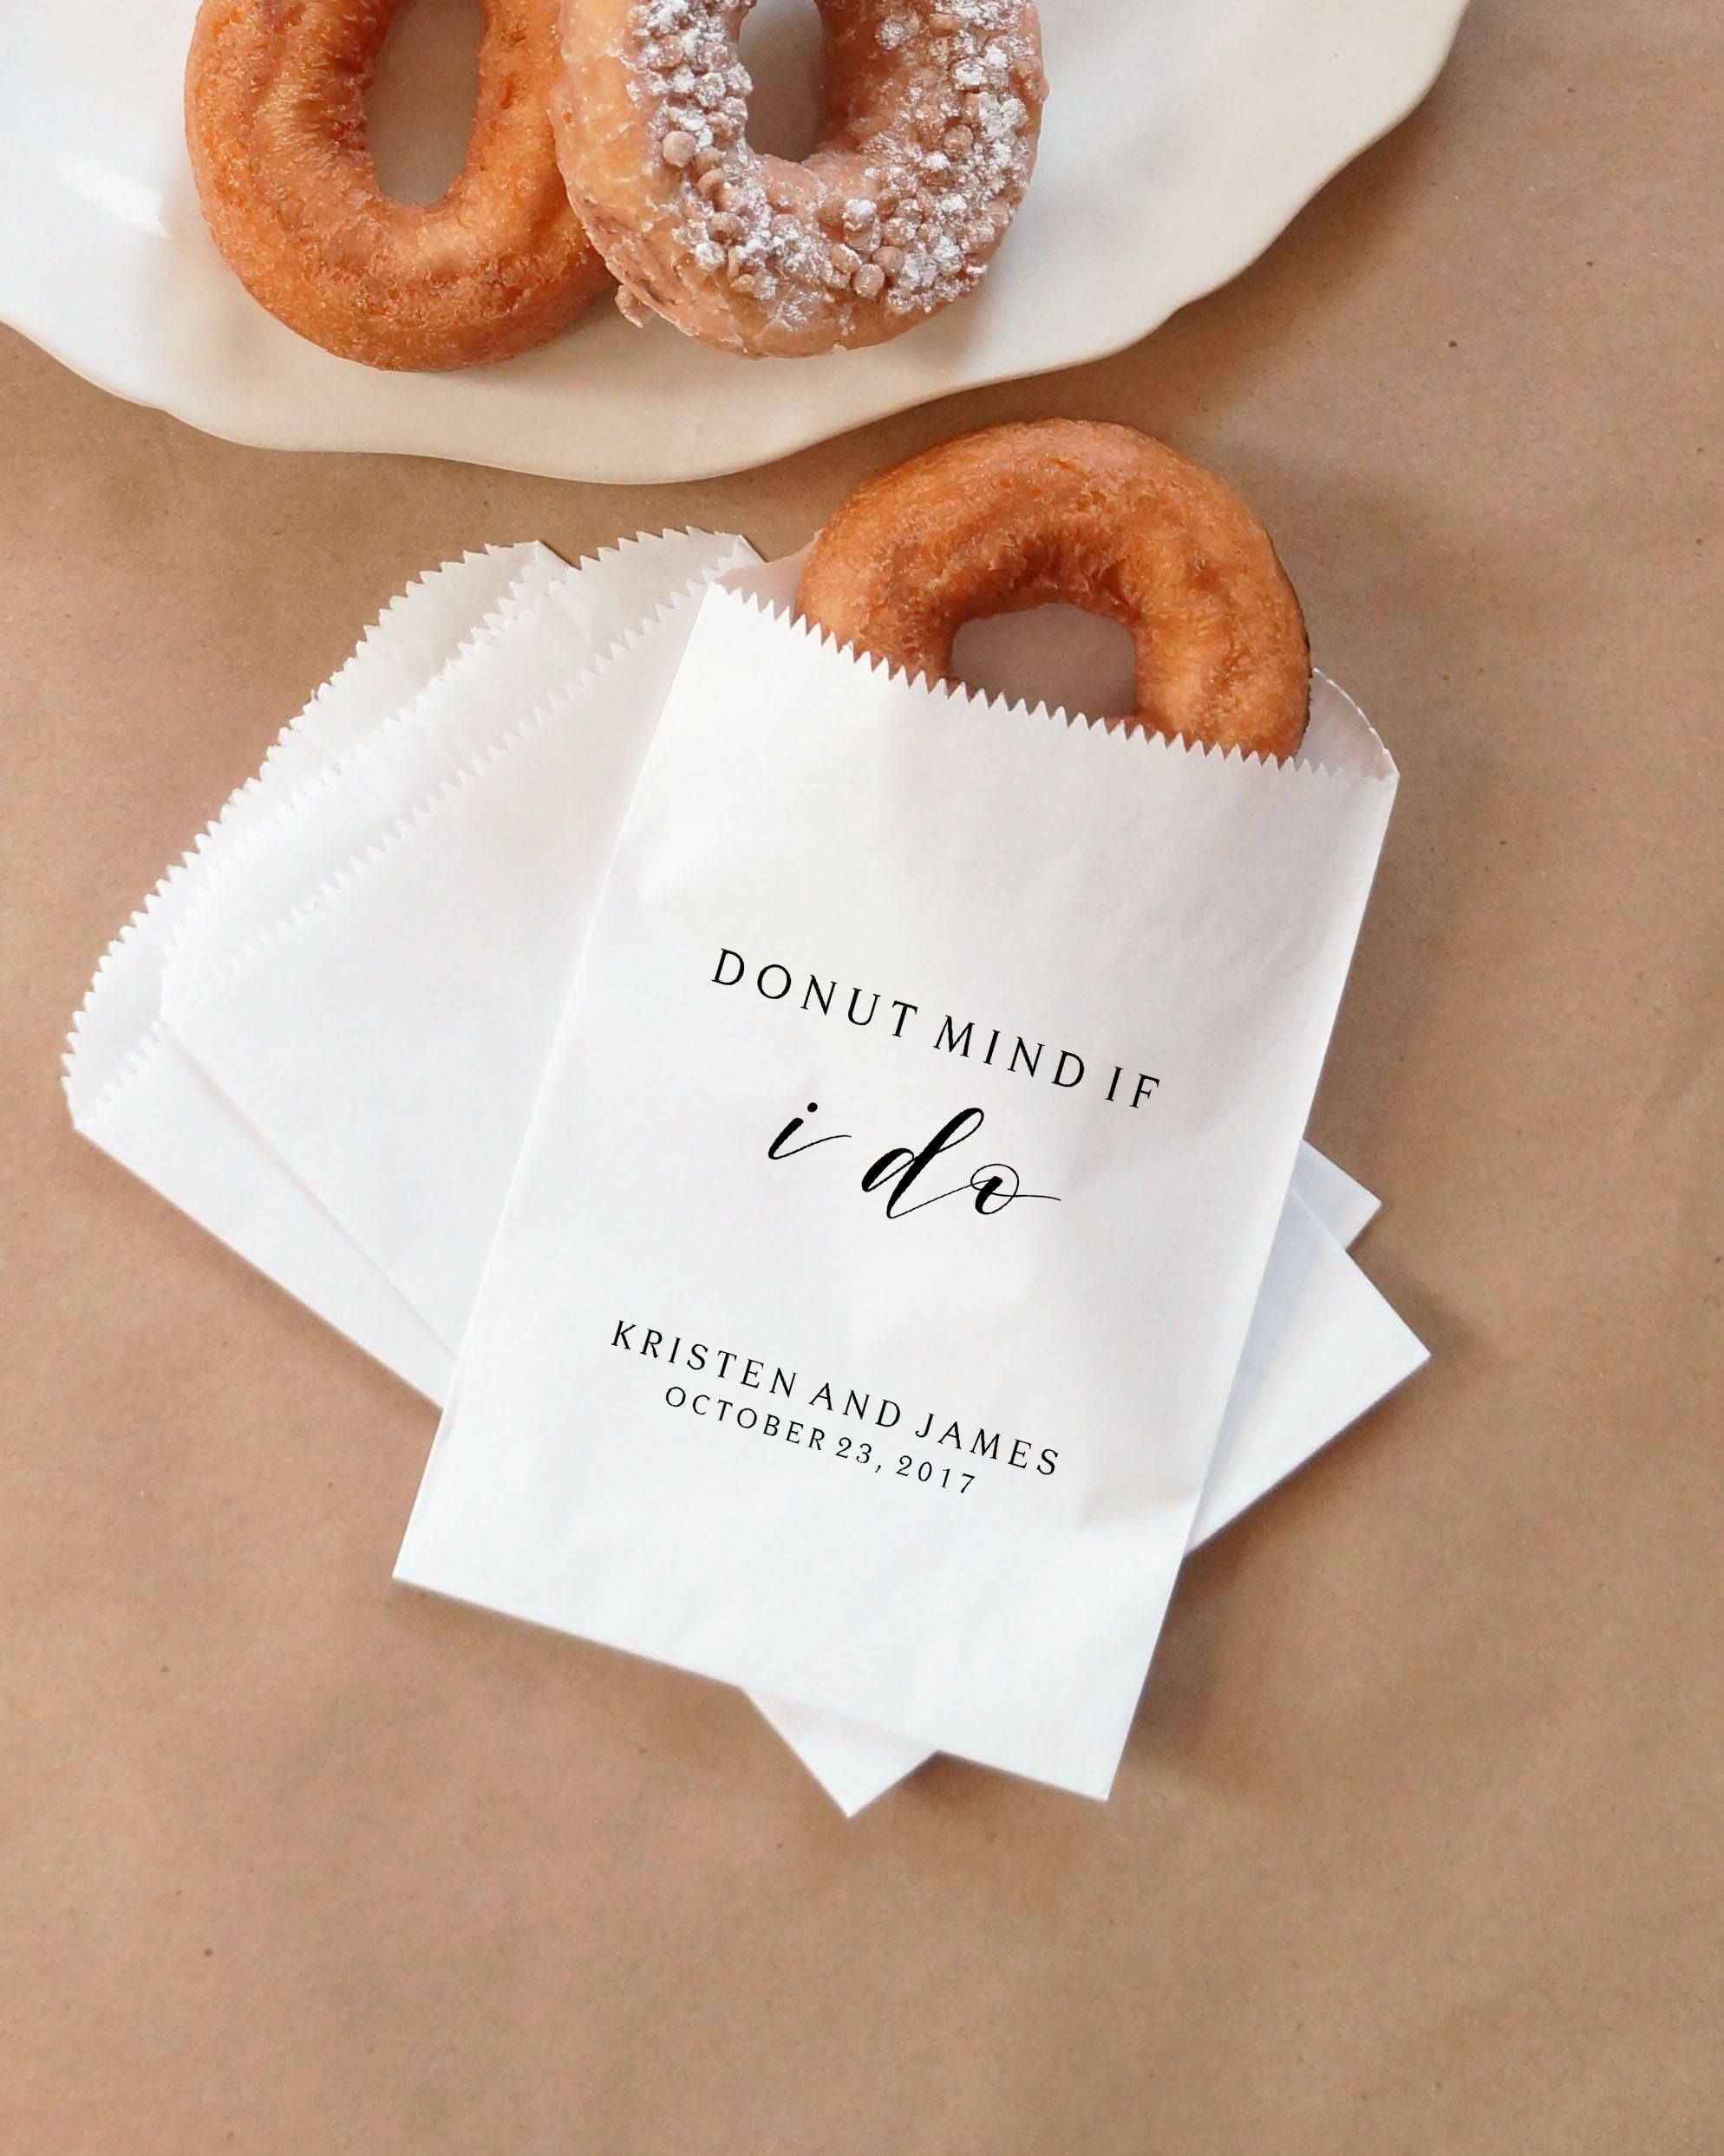 Donut mind if I do wedding favor bags! | Donut Favor Bags | Wedding ...